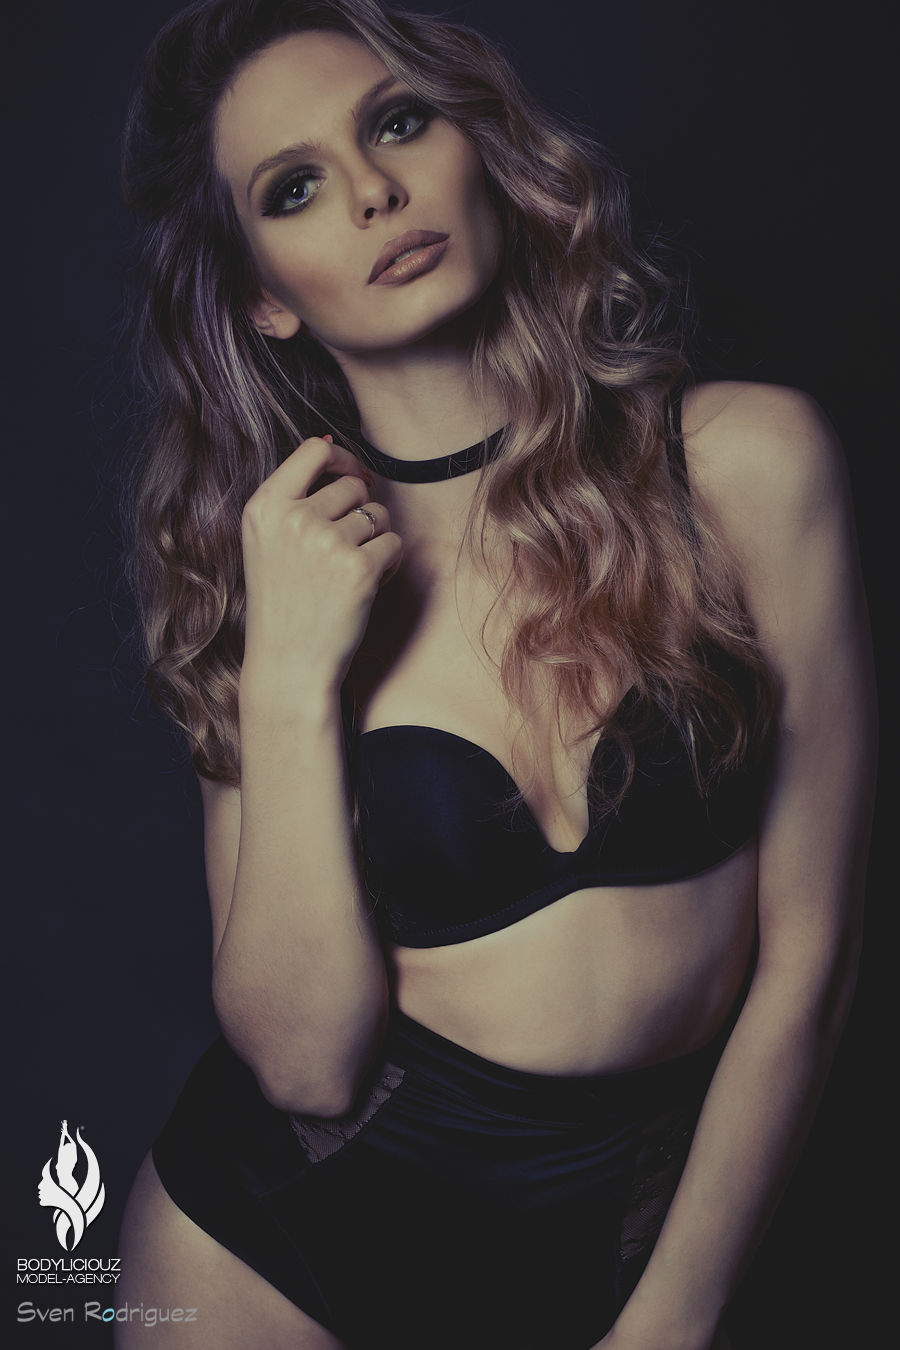 Karolina G